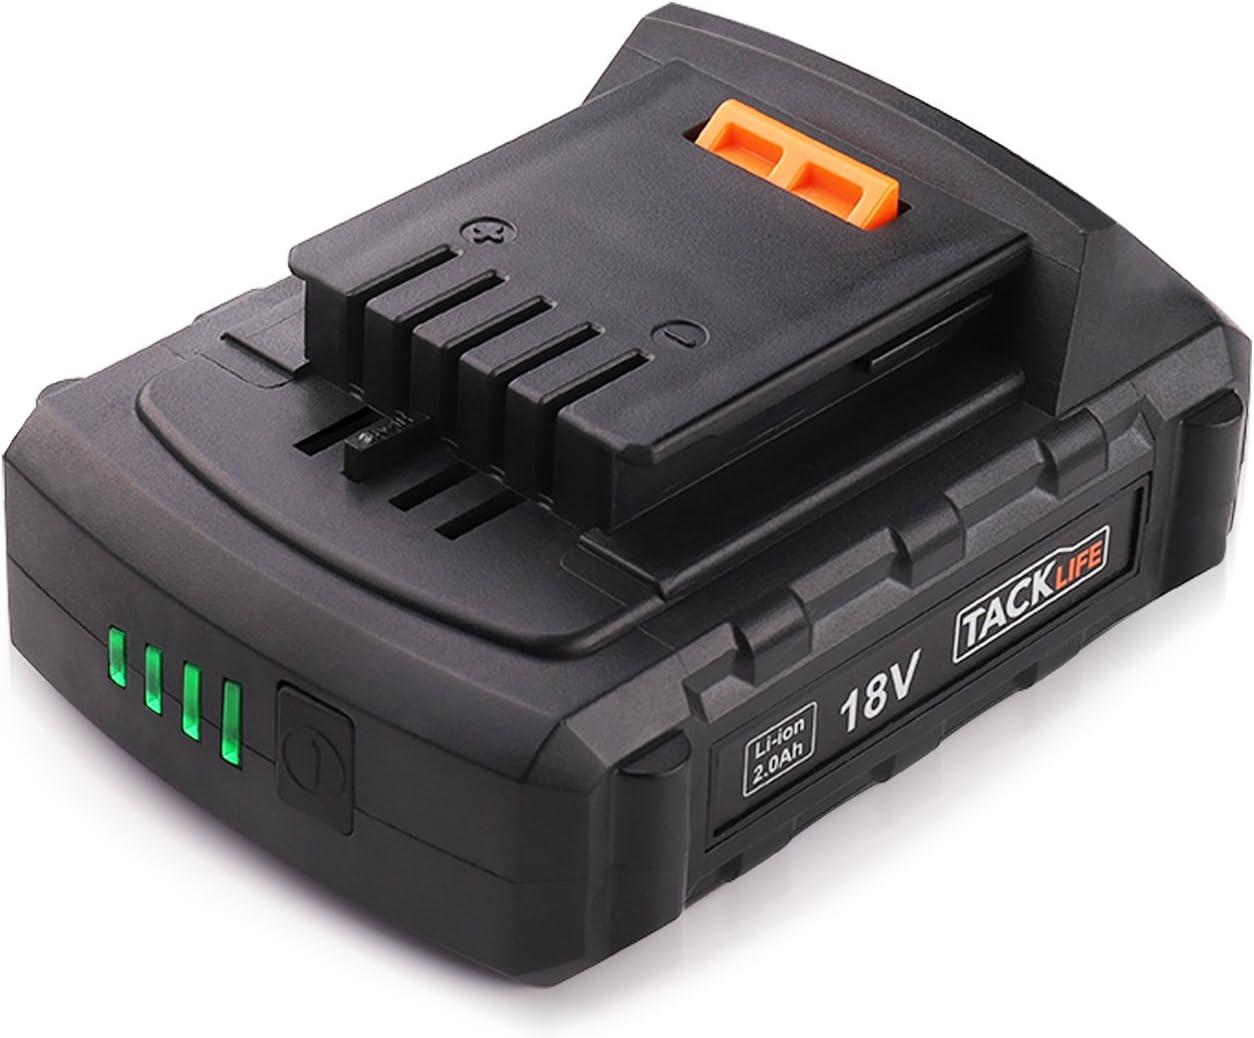 Batería TACKLIFE 18V PPK02B LED 2.0ah Batería para Taladro ...